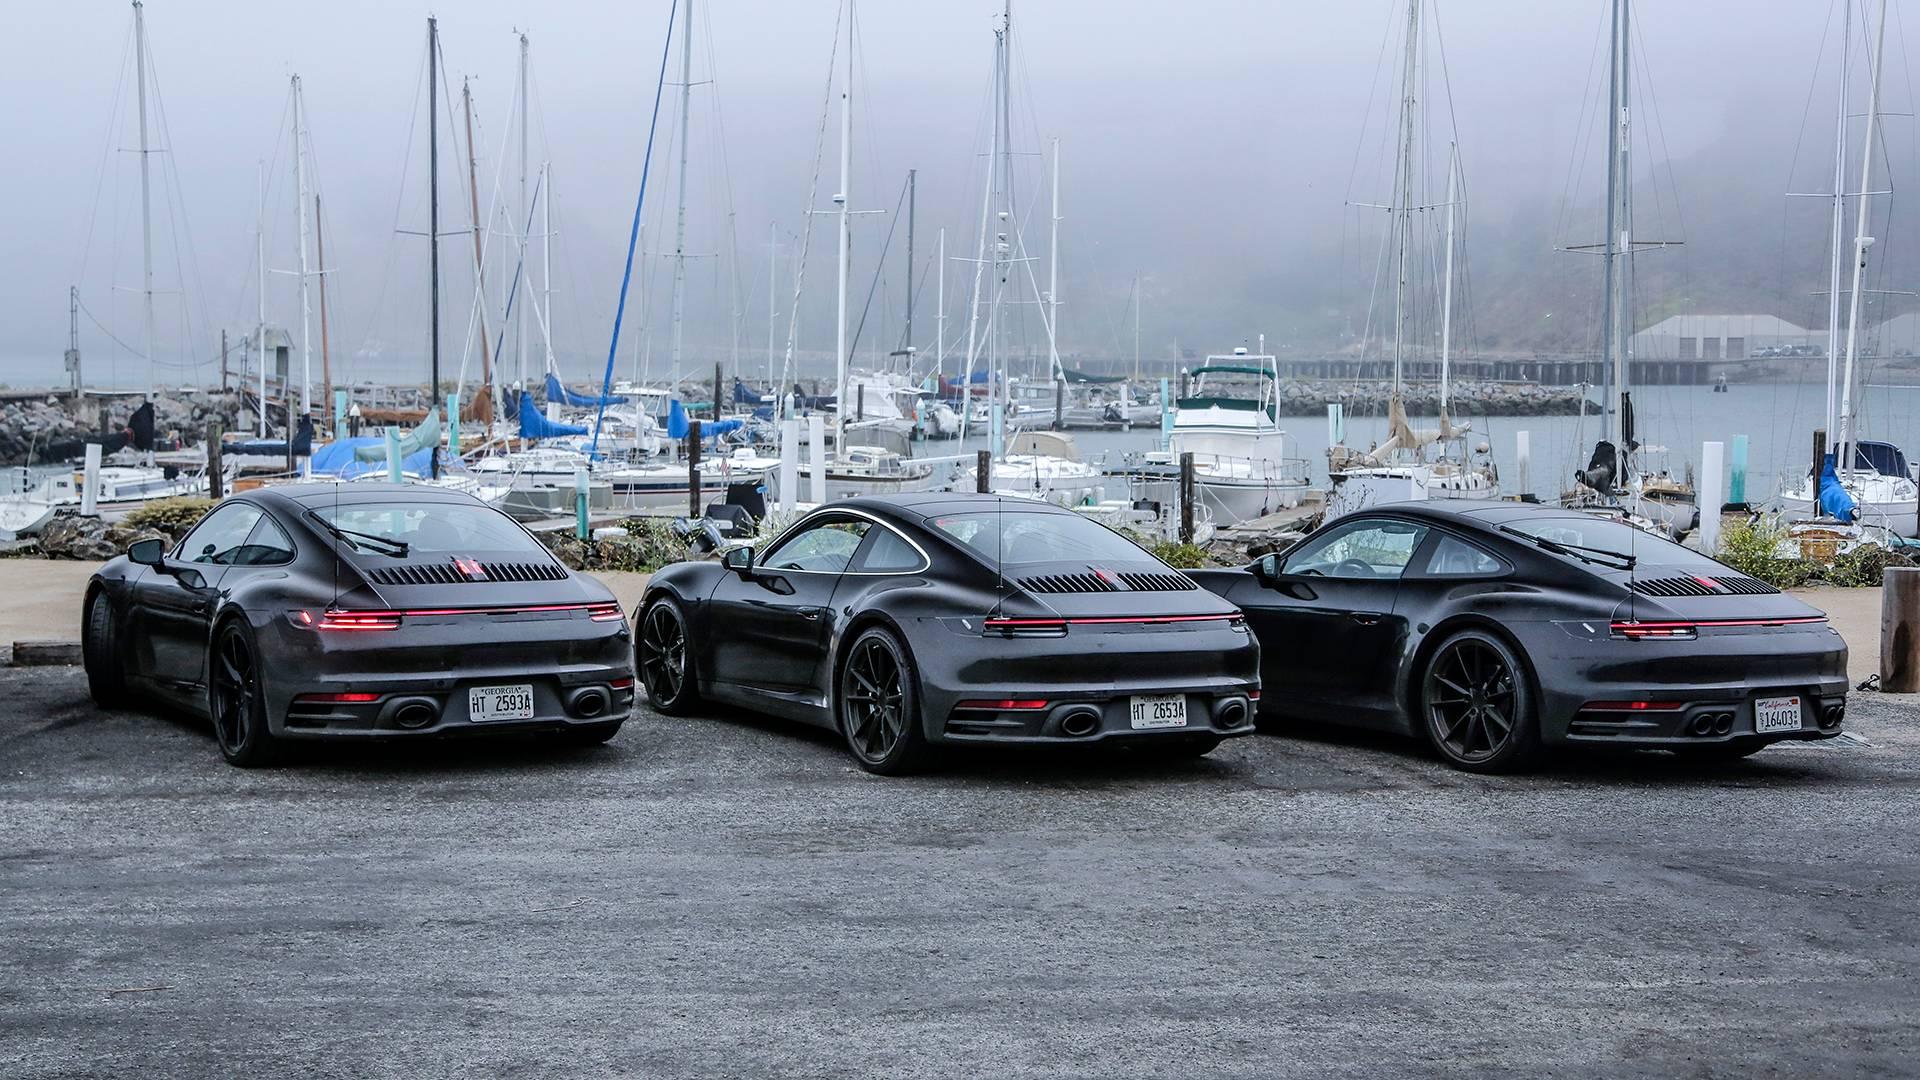 2020-porsche-911-carrera-s-prototype-2